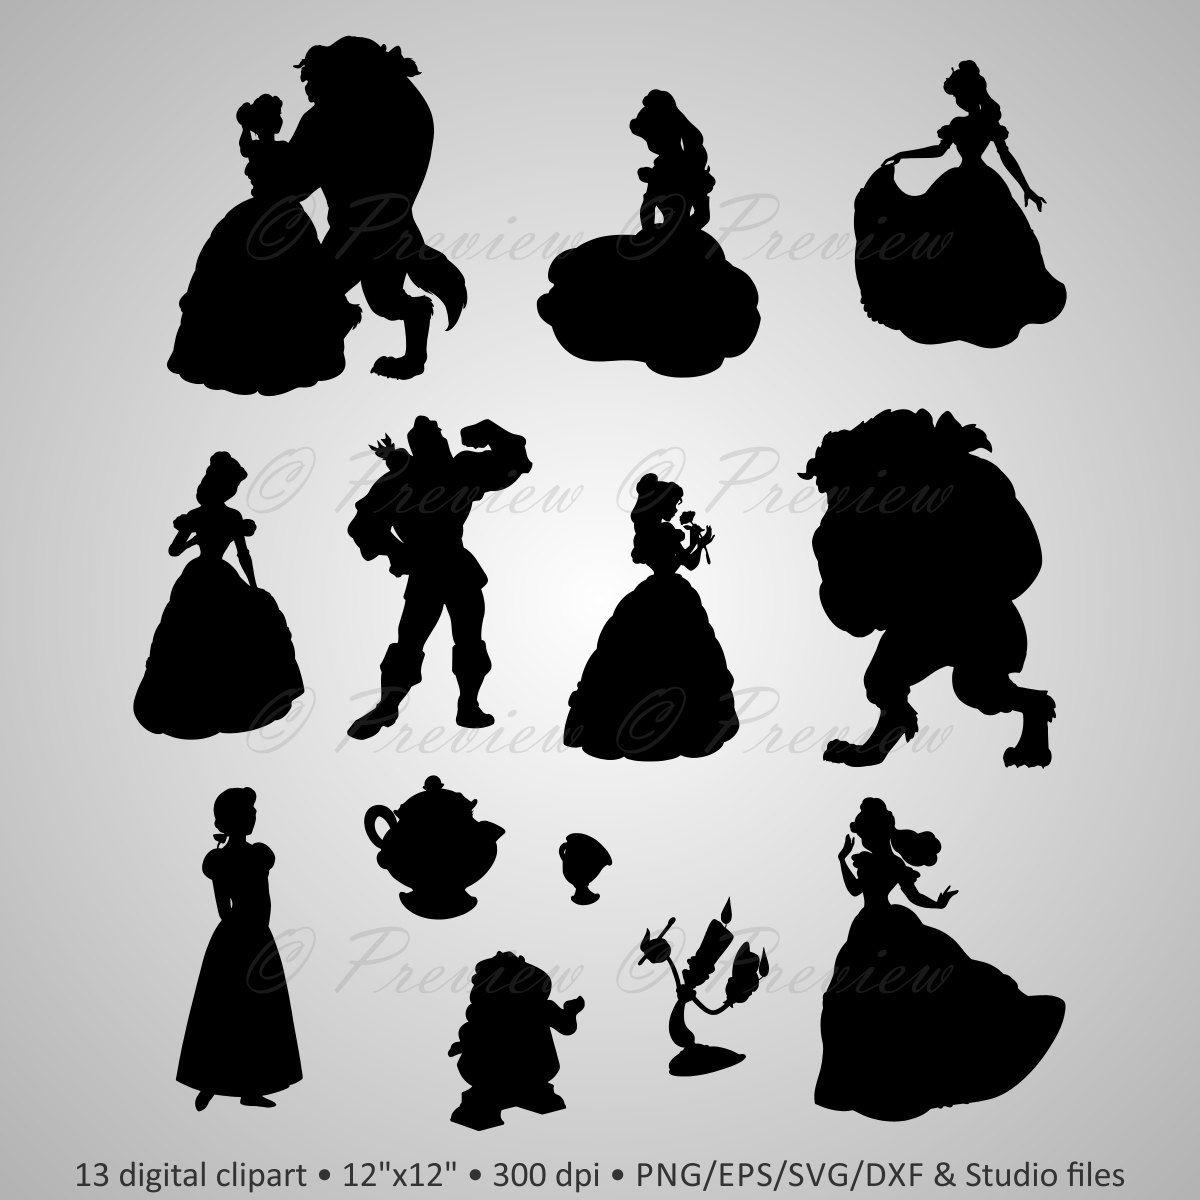 Buy get free digital. Beauty clipart silhouette